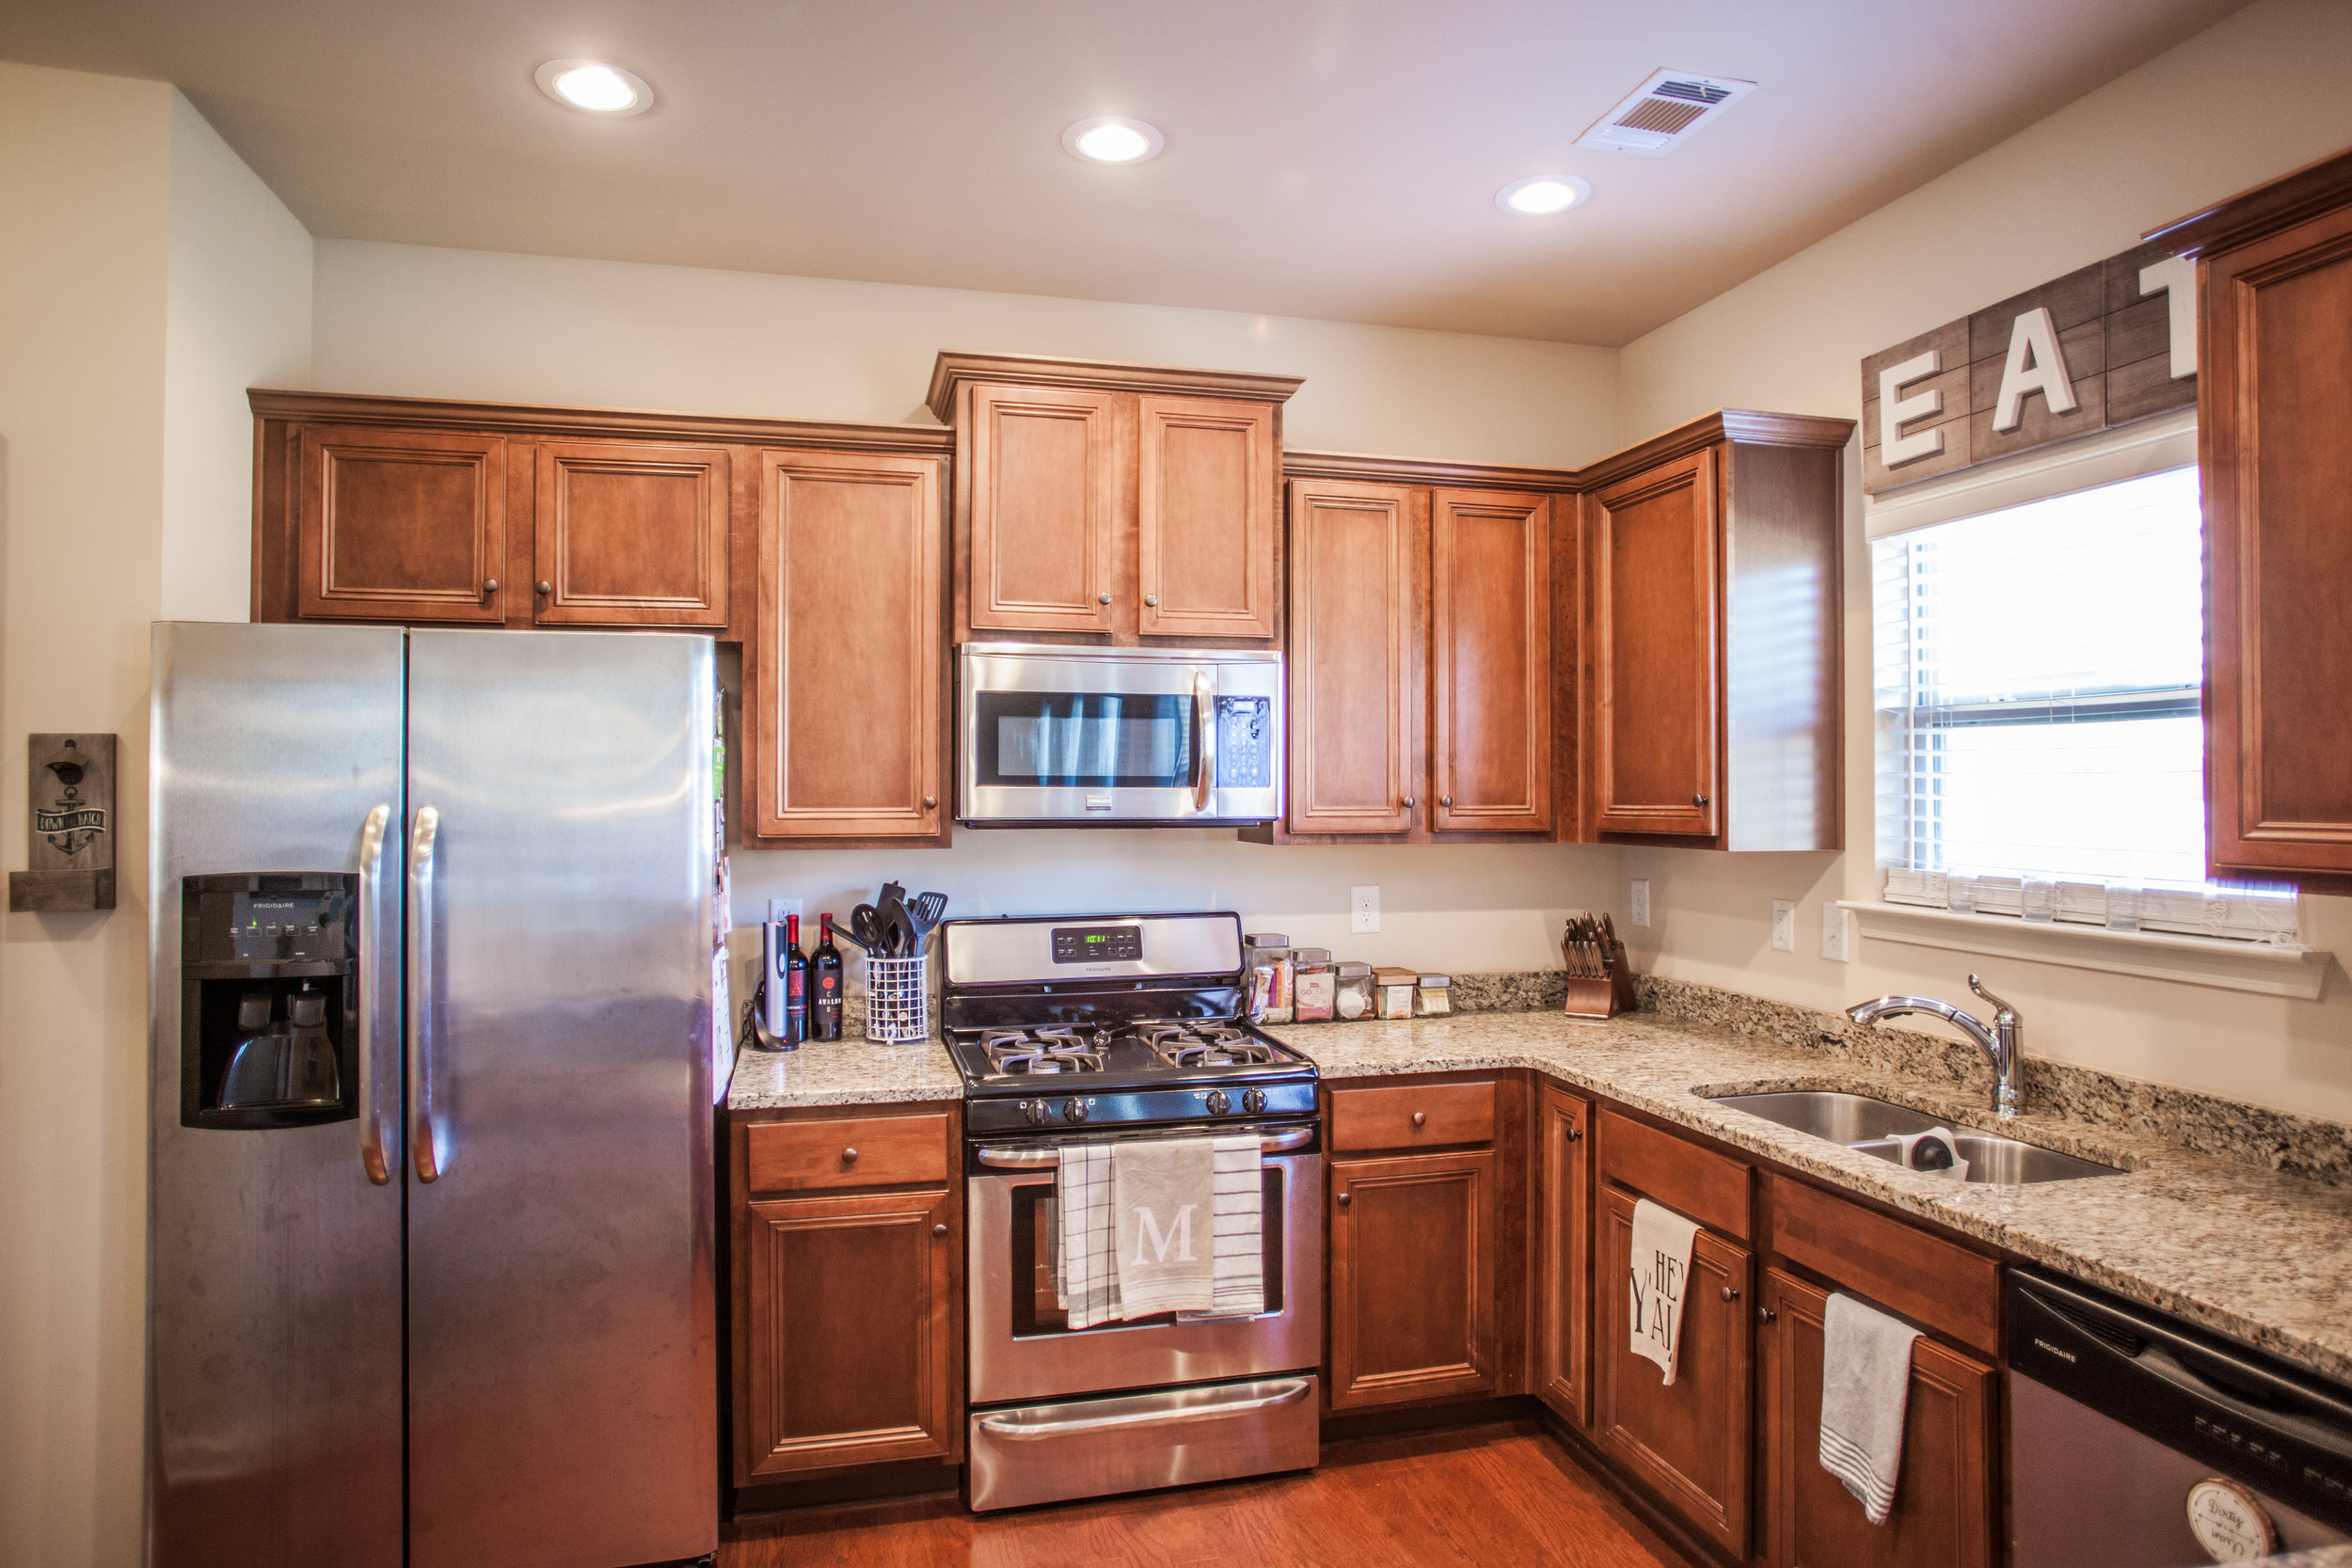 woodstock-ga-house-for-sale-wingard-real-estate-under-300k-40.jpg